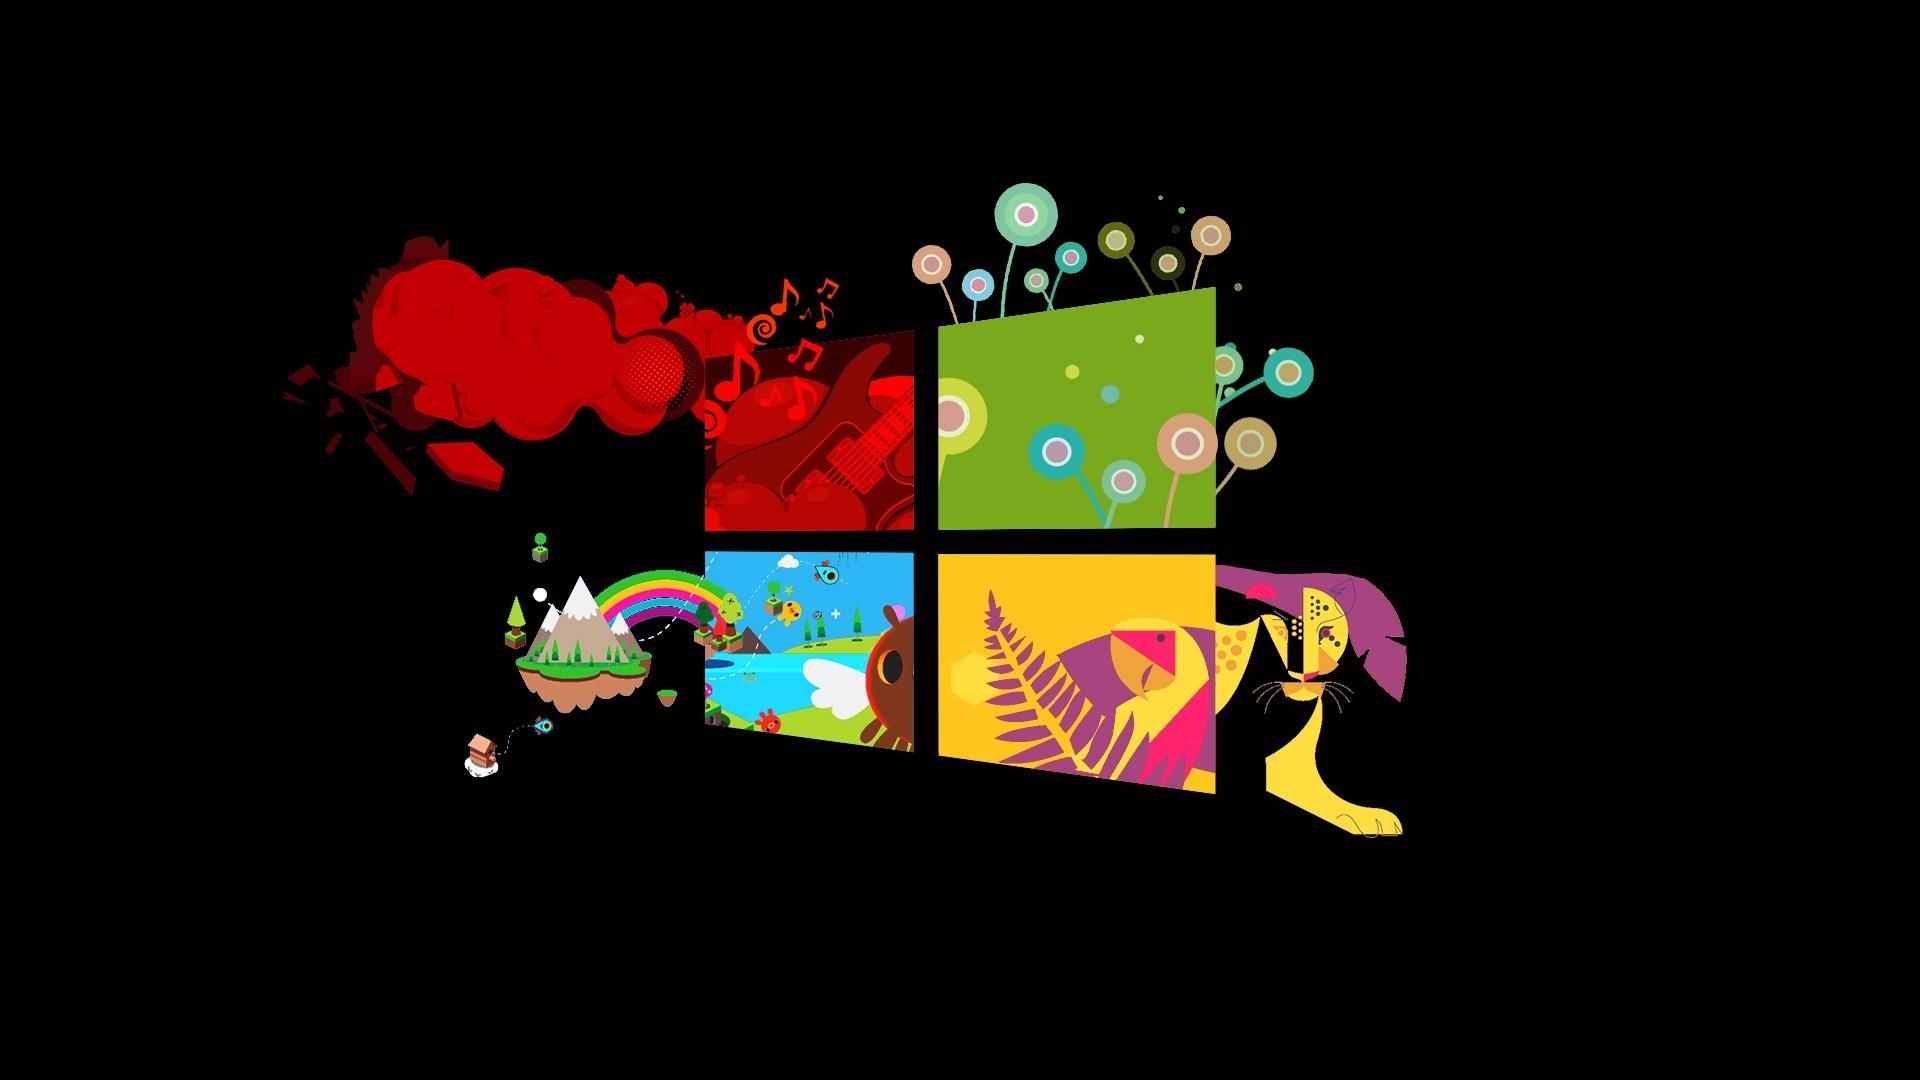 Windows 8 Black Wallpapers Group 91